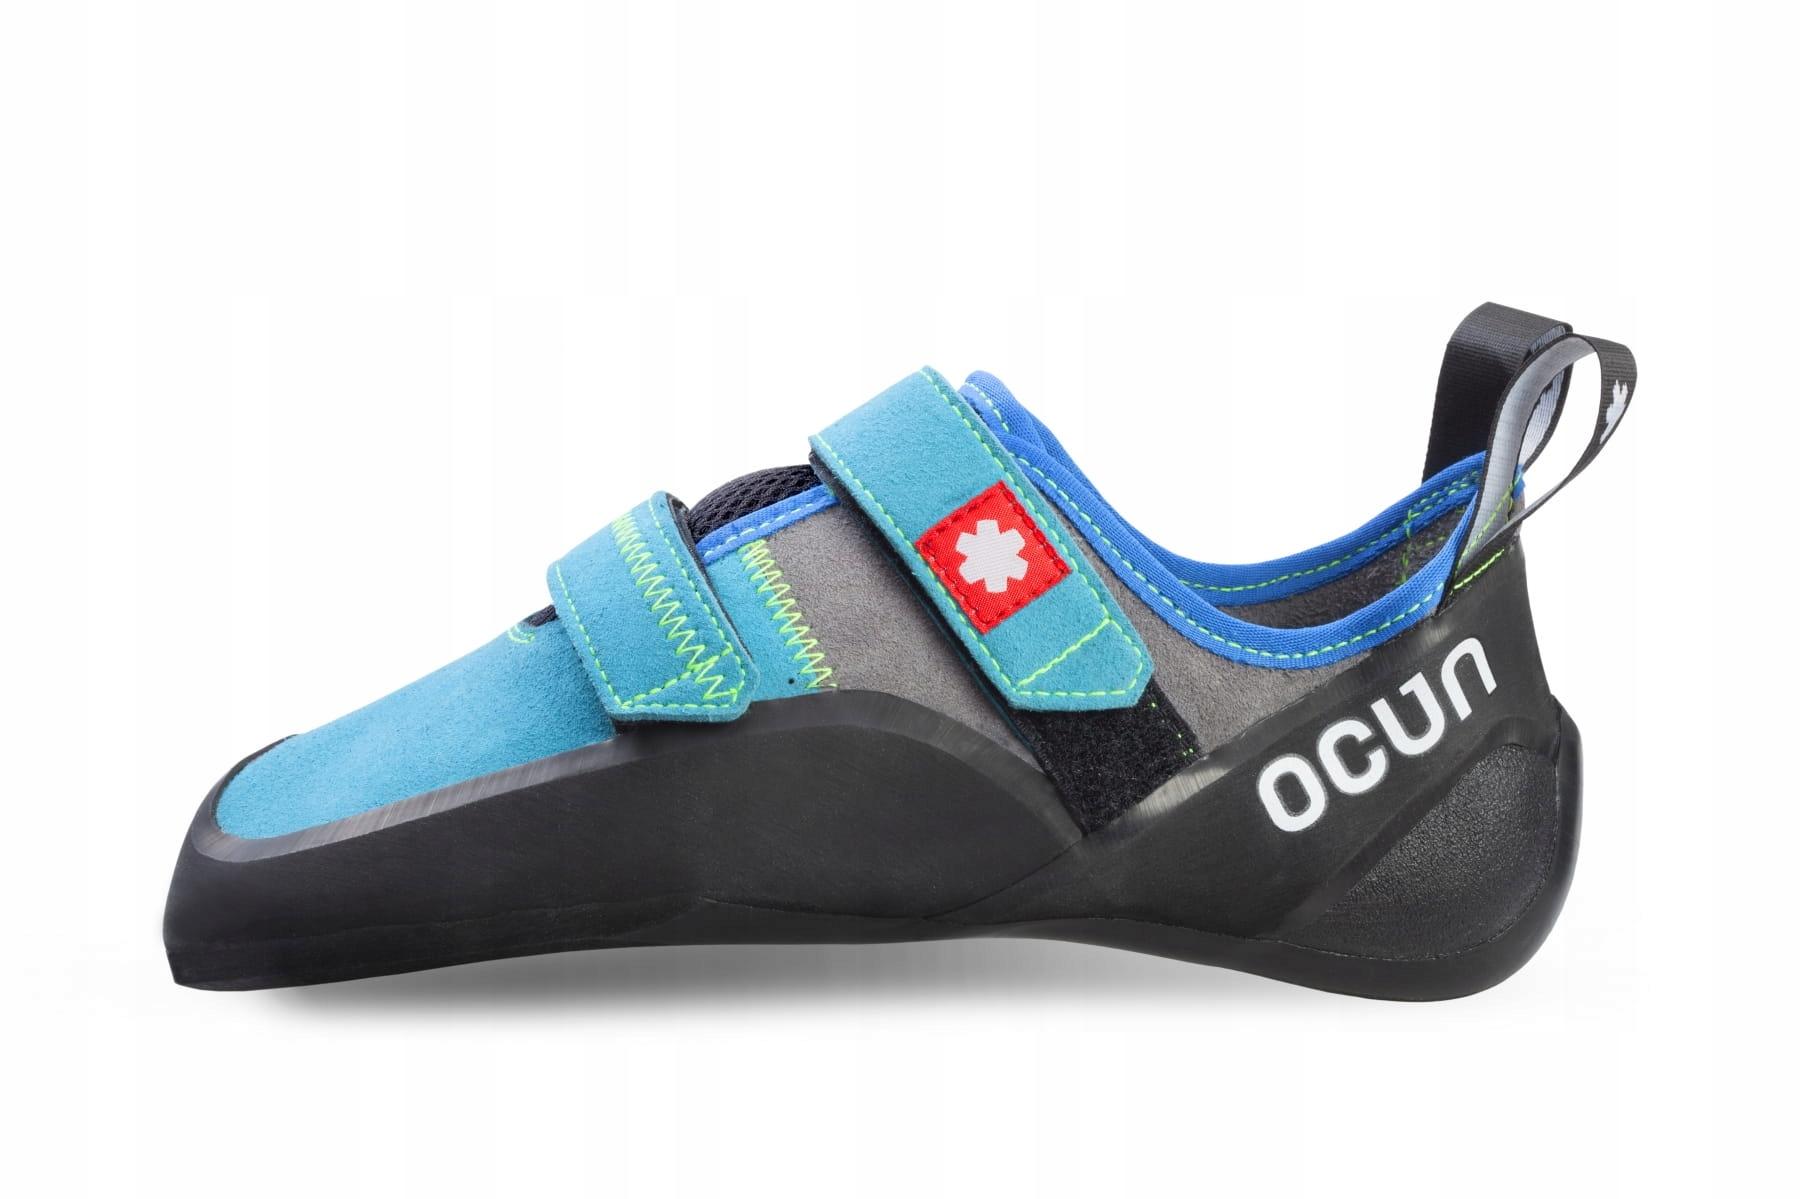 Lezecké topánky Ocun Strike QC Blue - 45